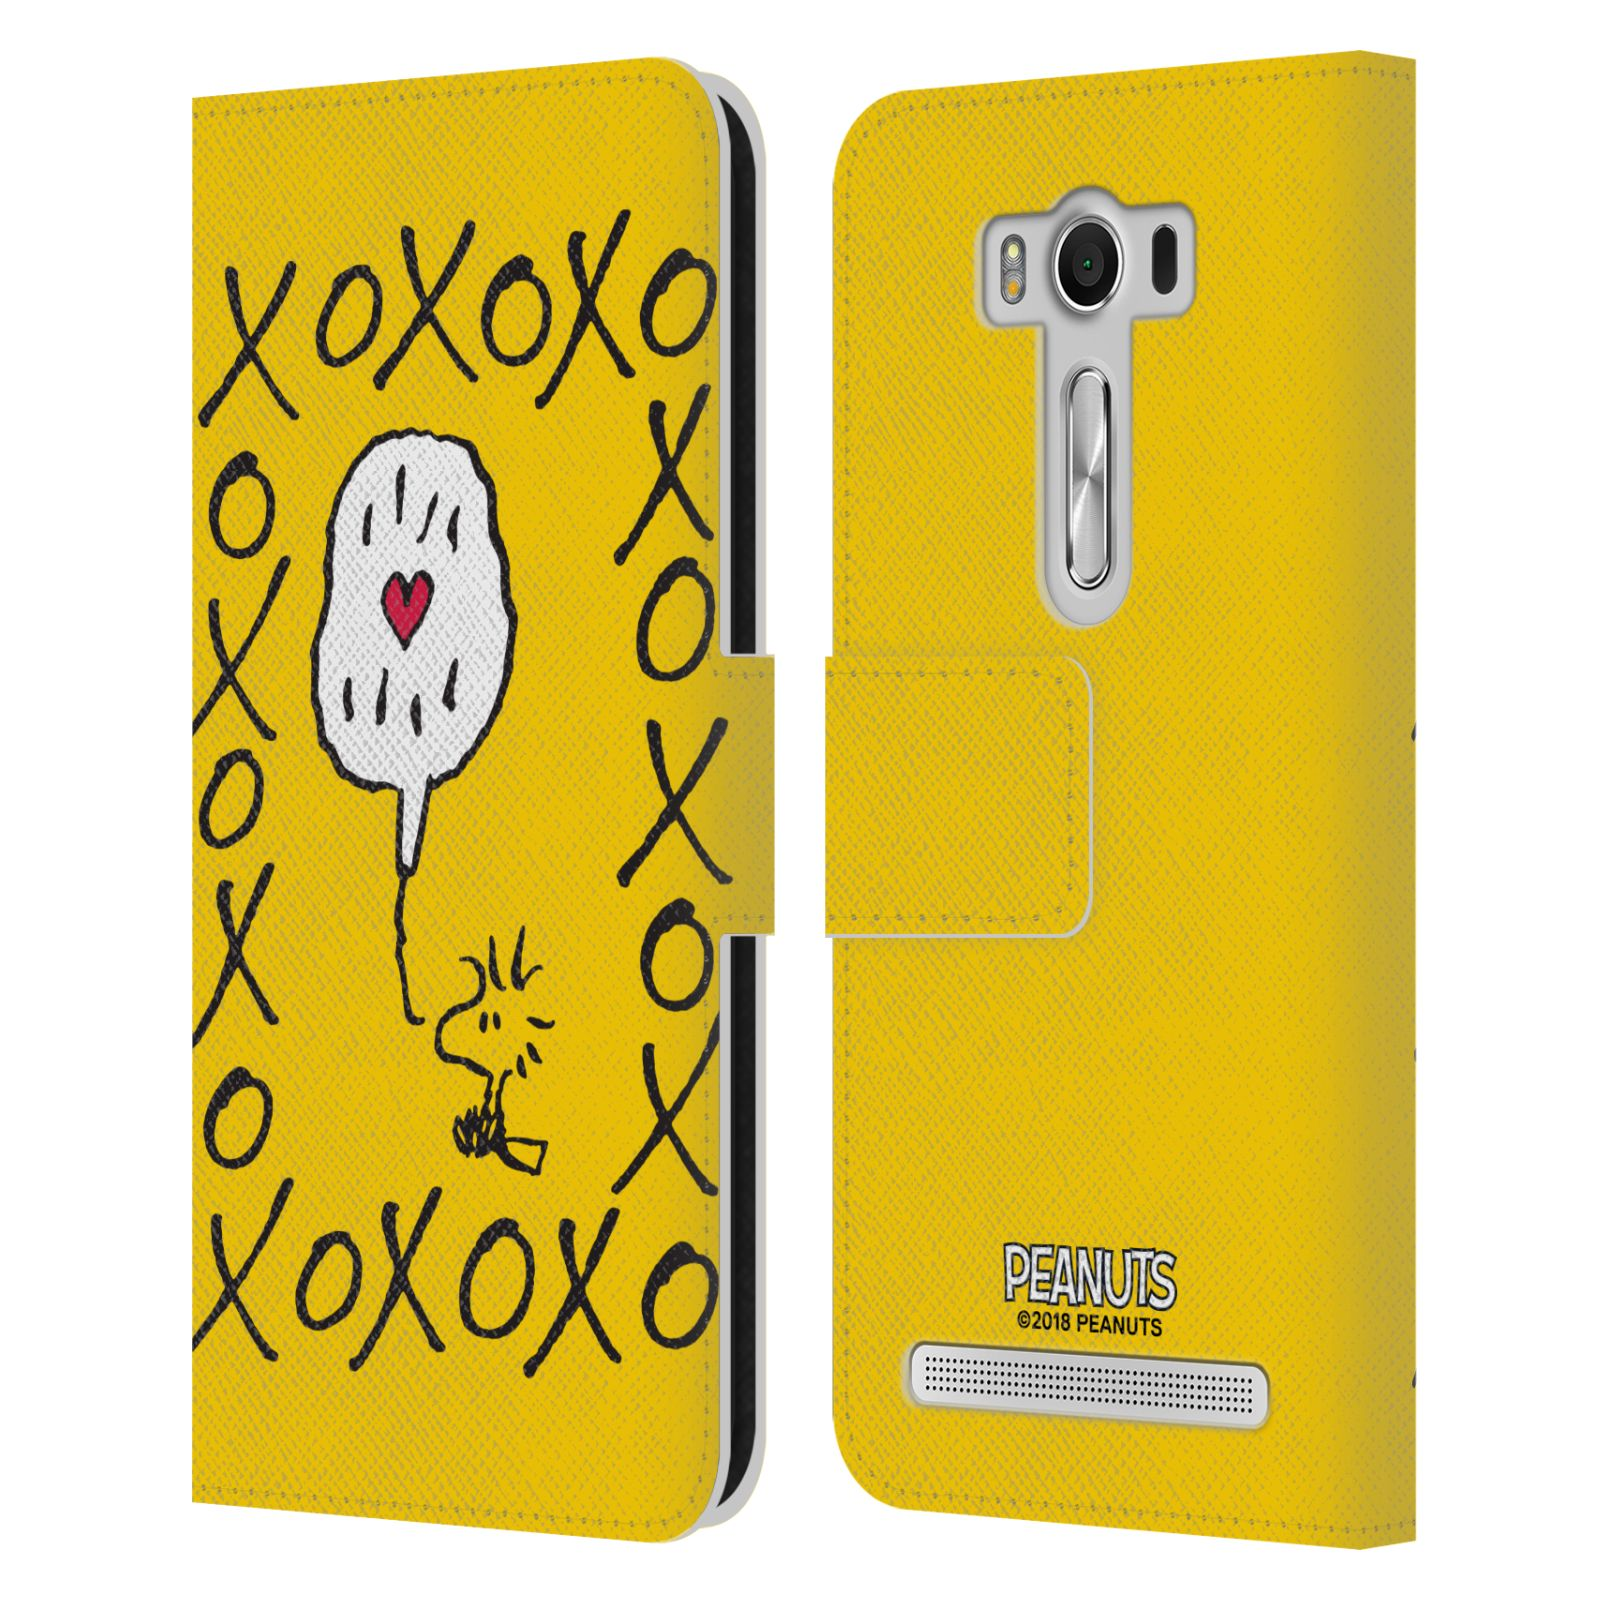 Pouzdro na mobil Asus Zenfone 2 Laser ZE500KL - Head Case - Peanuts - Woodstock ptáček XOXO